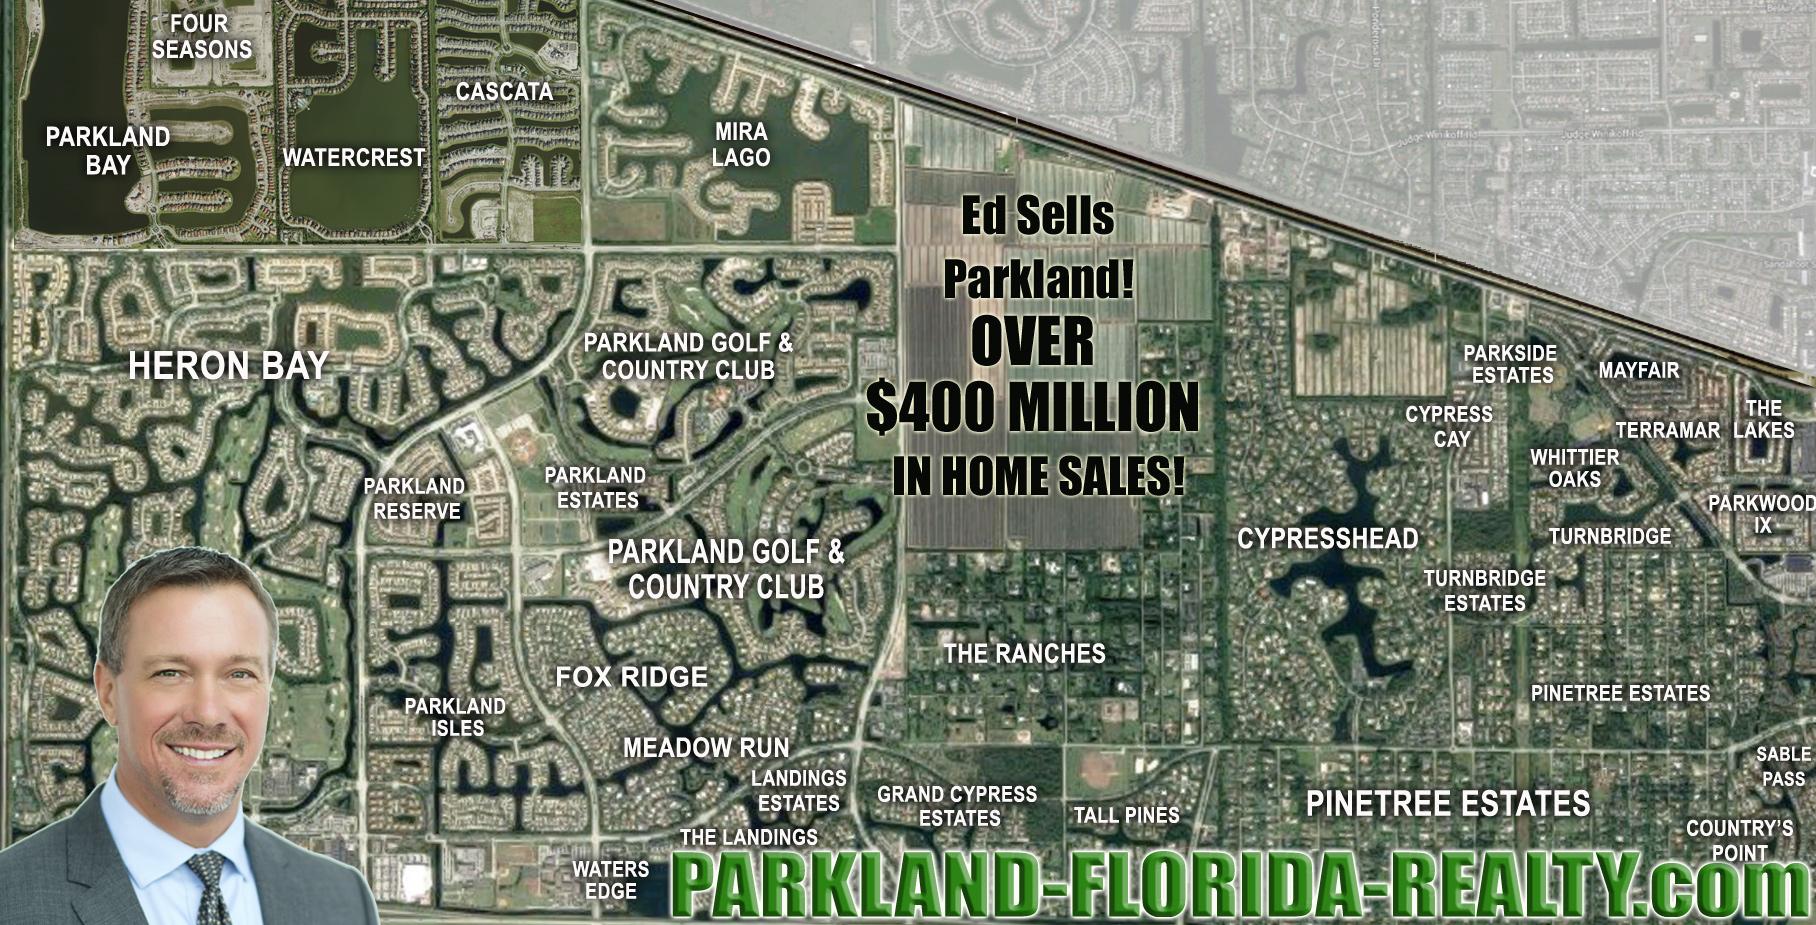 Parkland Florida Map.Parkland Florida Real Estate For Sale